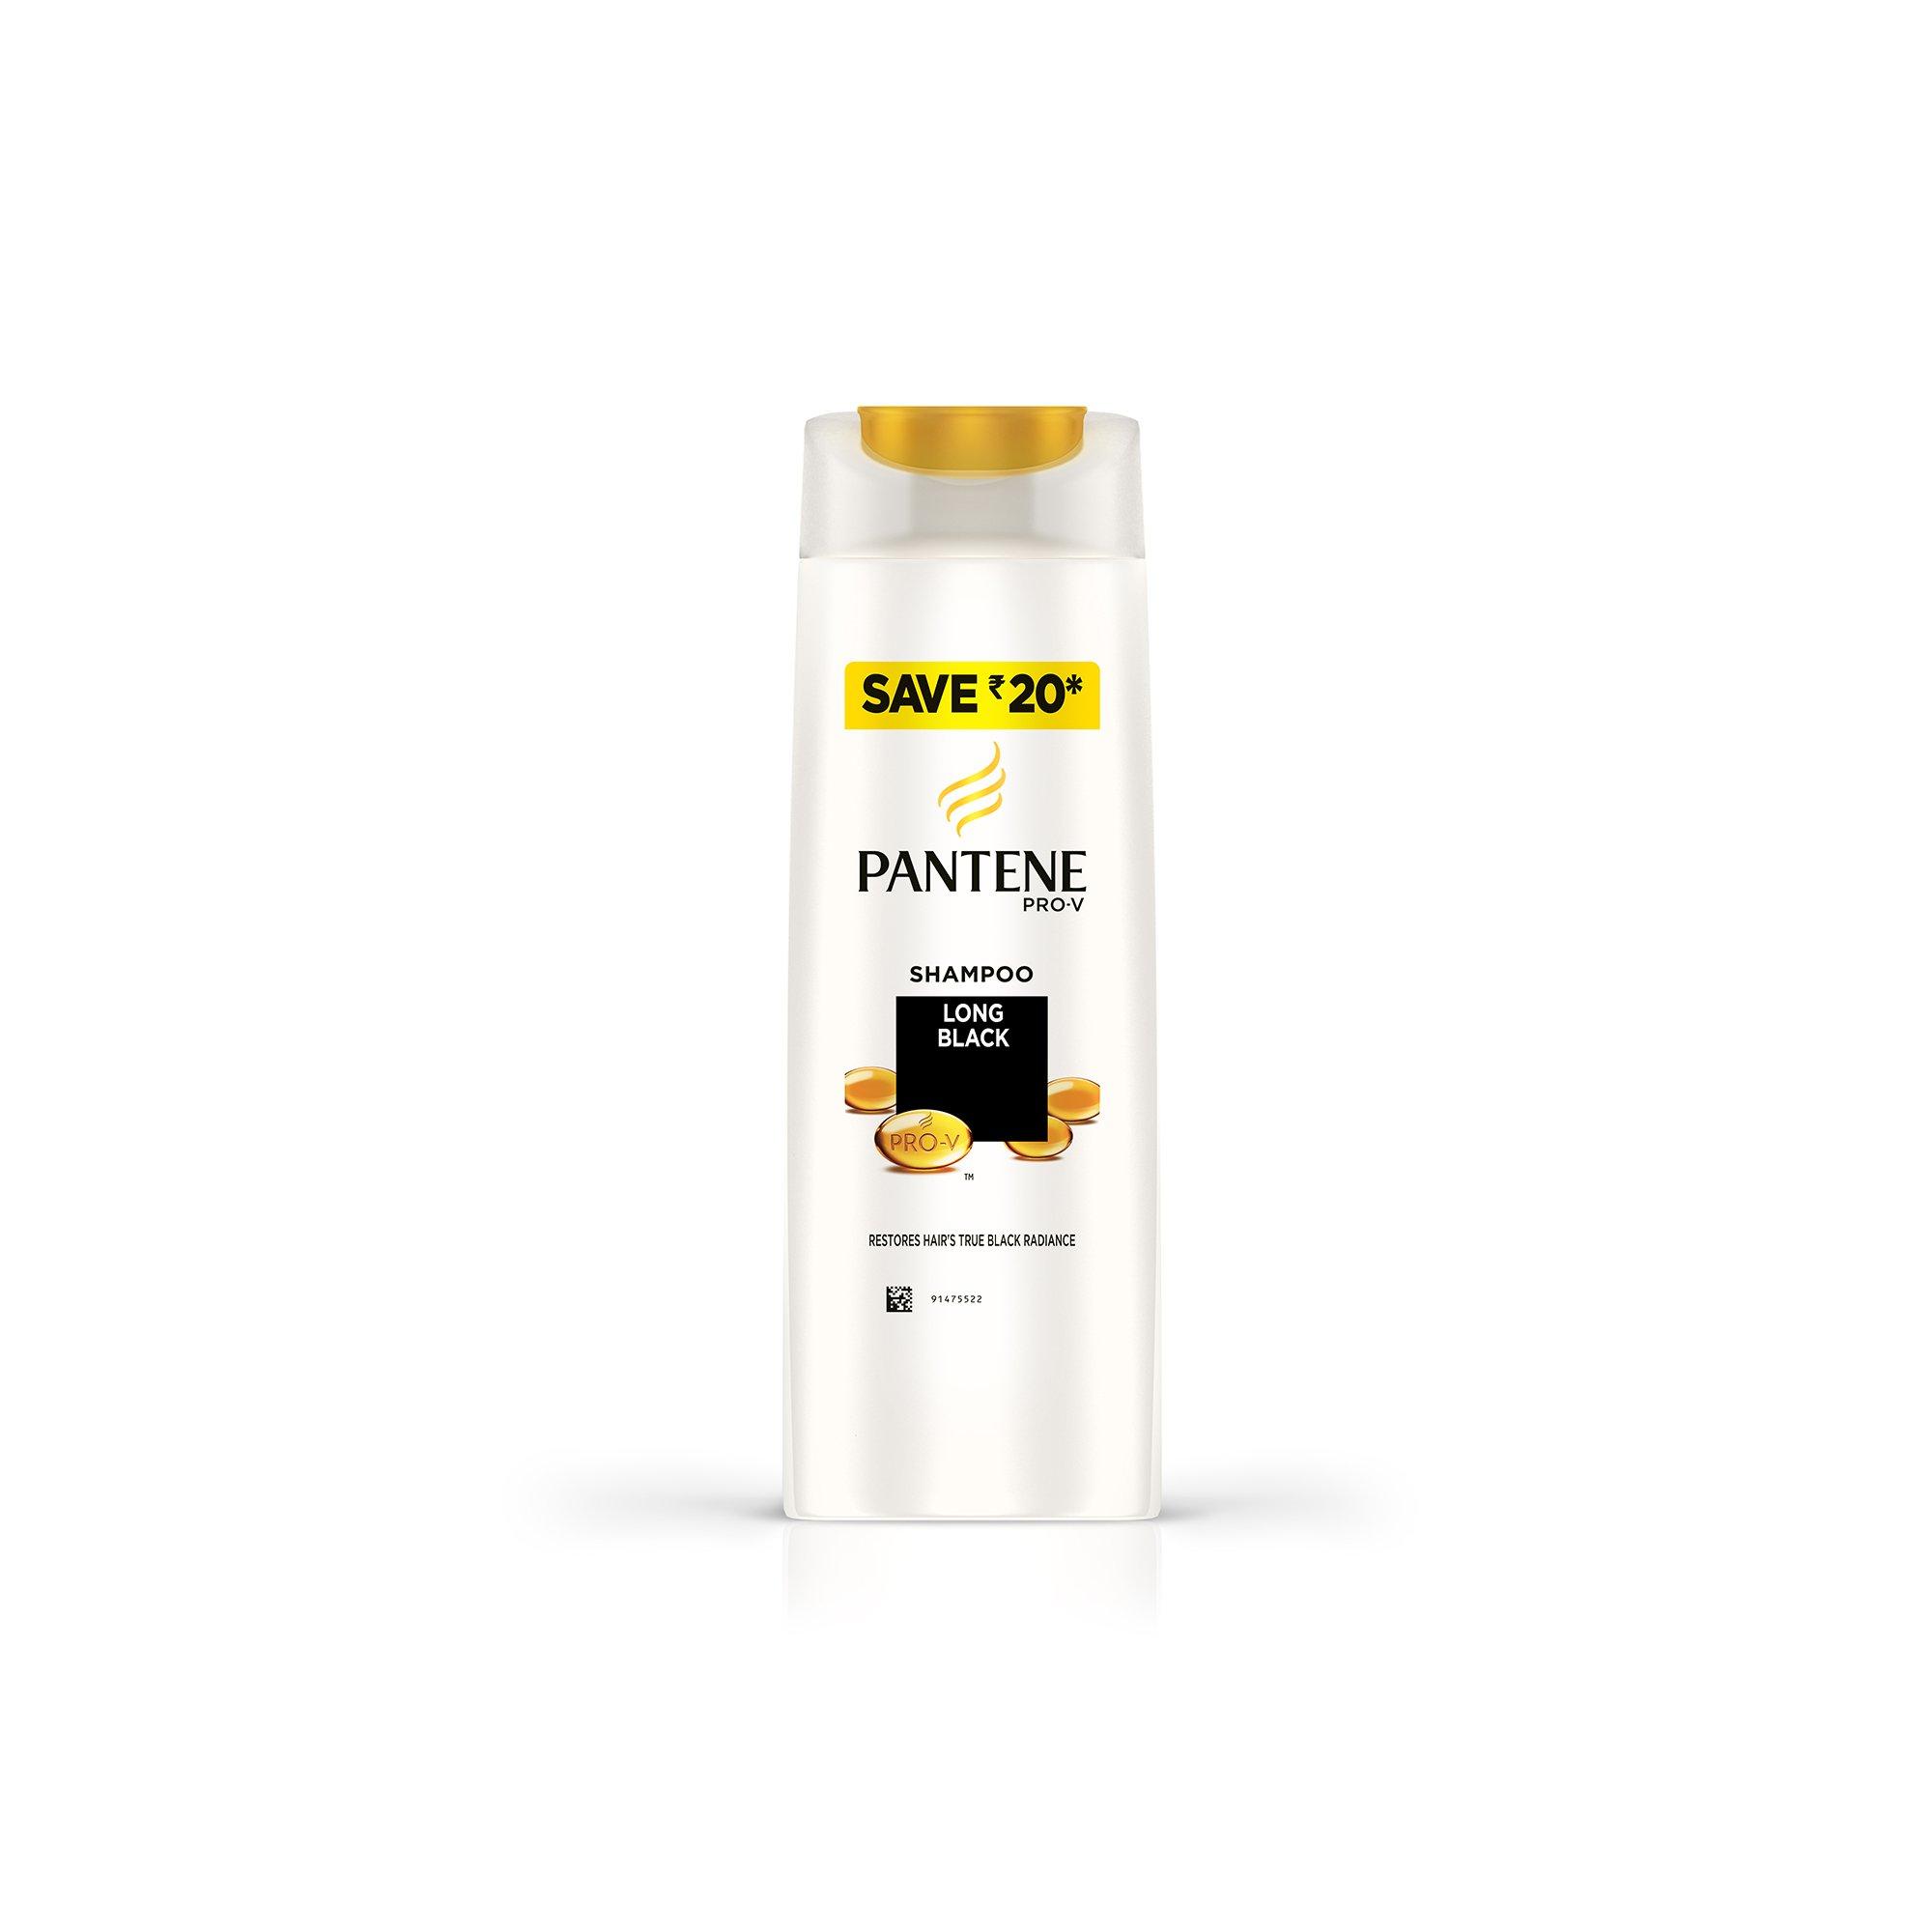 Pantene Long Black Shampoo, 180ml product image